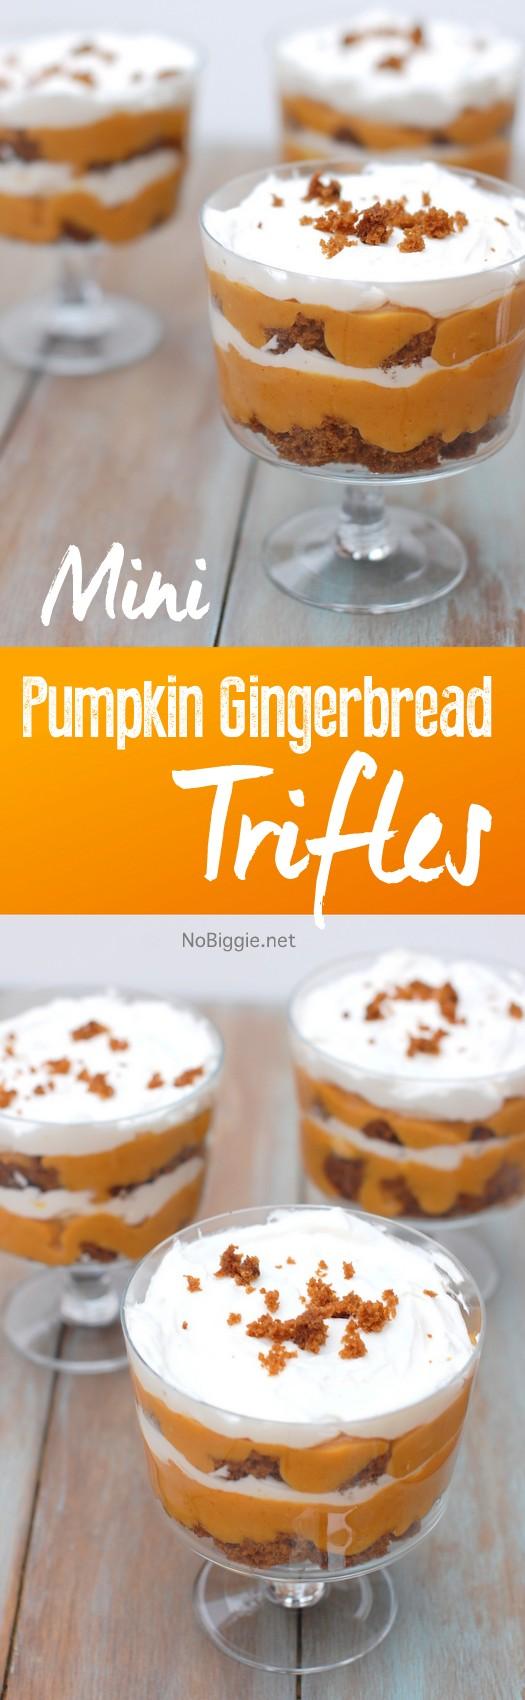 pumpkin gingerbread mini trifles | NoBiggie.net